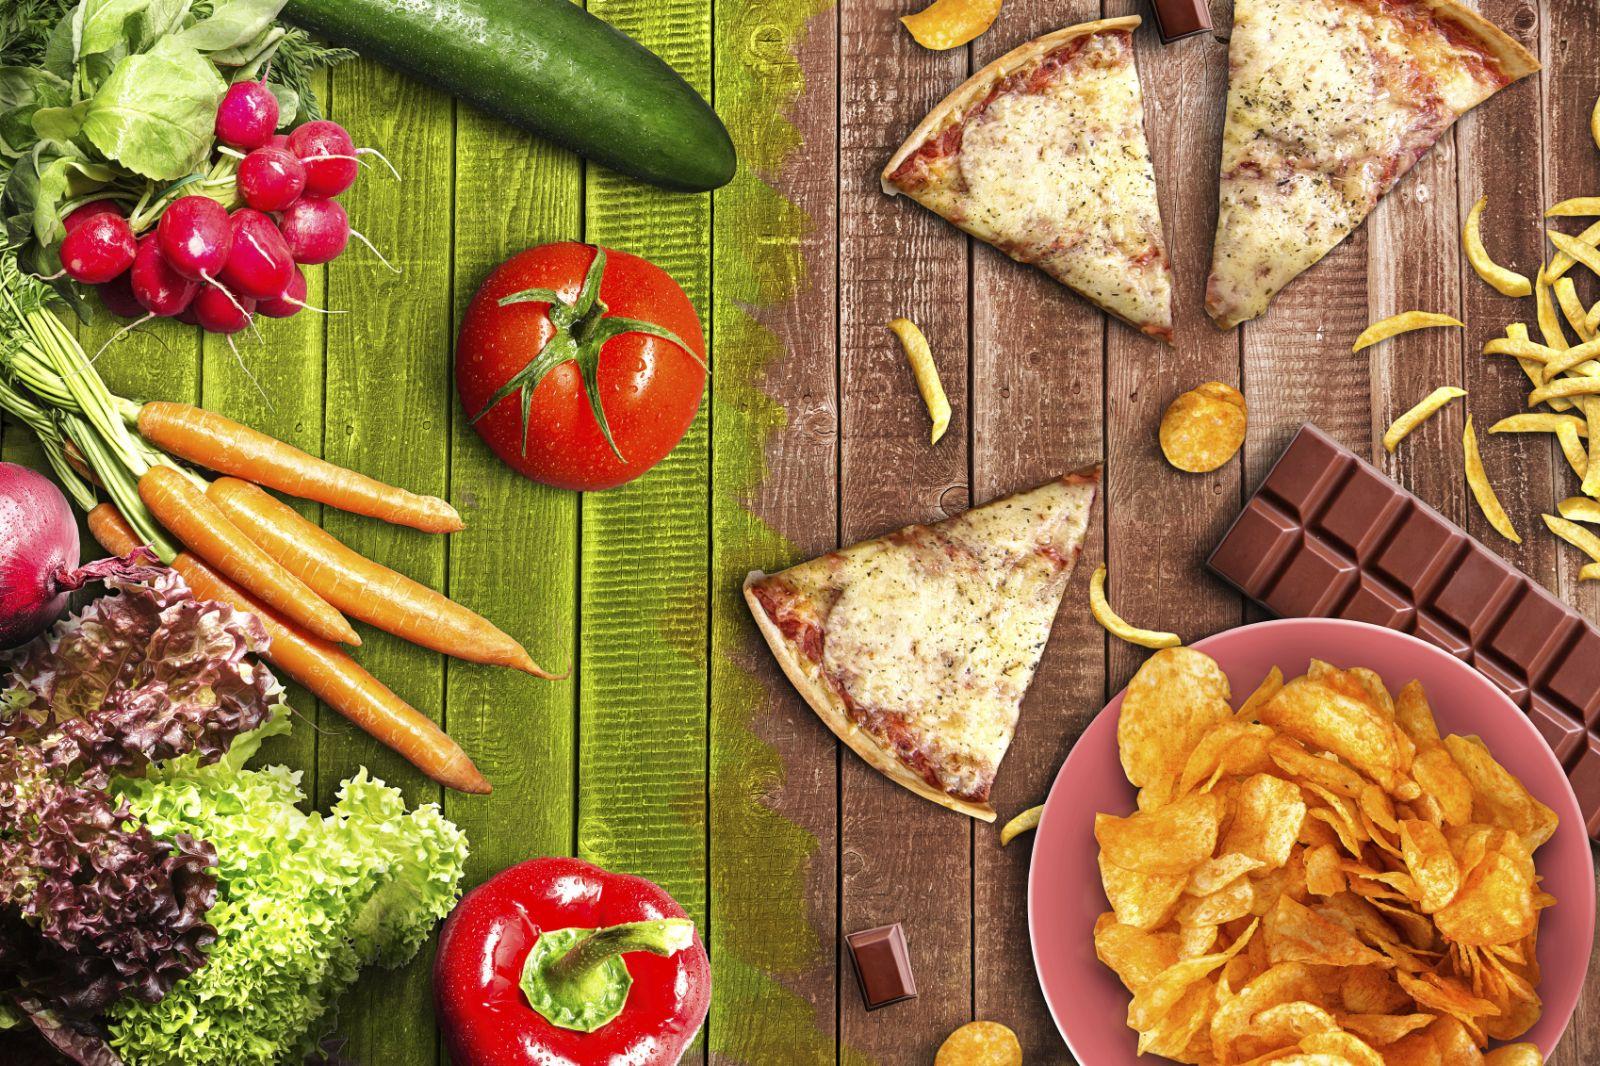 Alat Penghilang KOmedo Paling Bagus Ialah Dengan Mengganti Pola Makan Menjadi Lebih Sehat